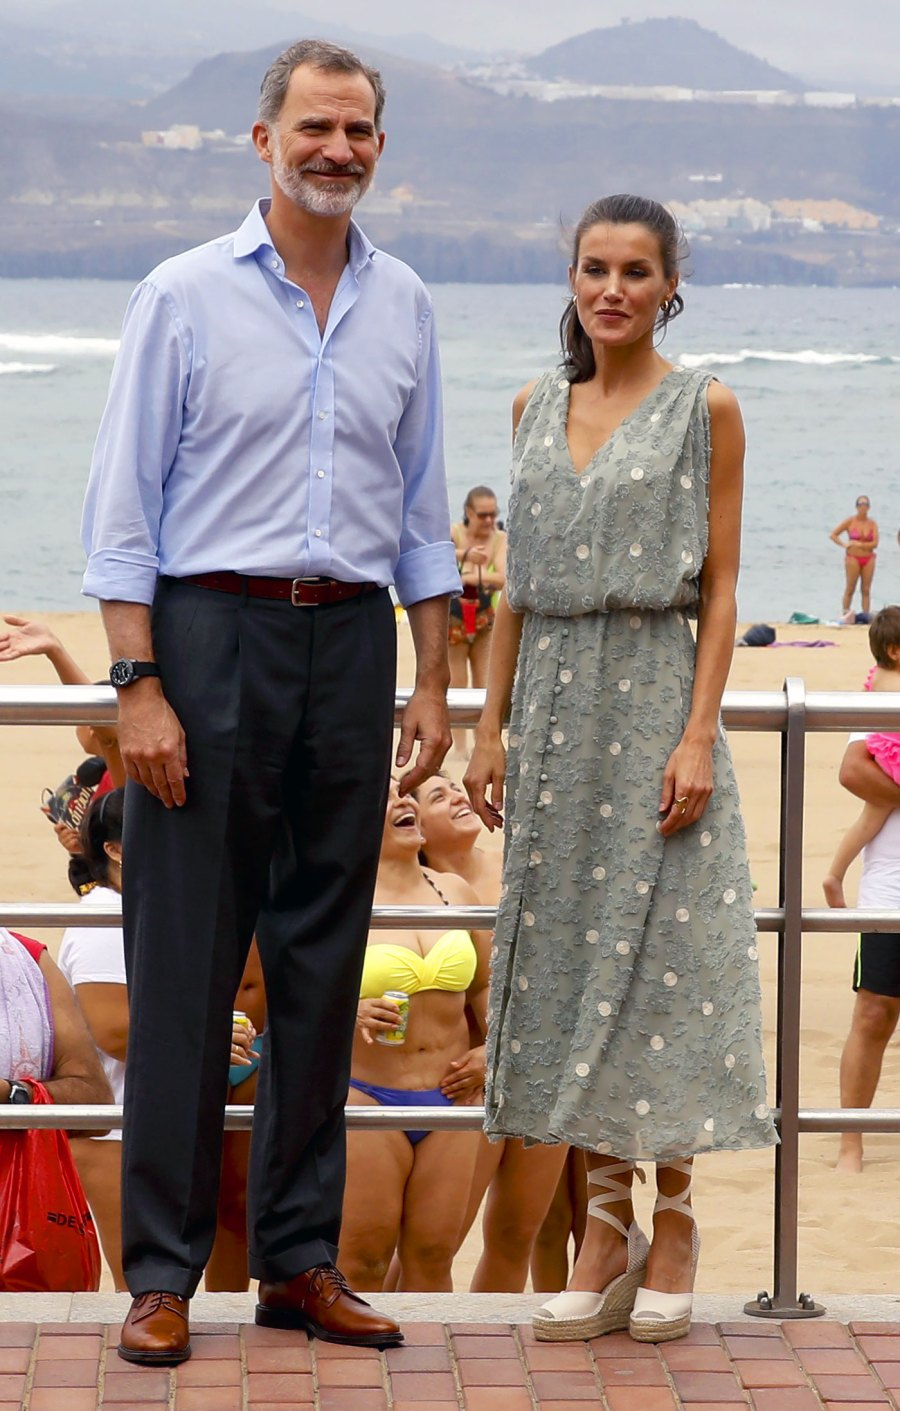 Queen Letizia's Regal Summer Dress Is a $25 Zara Number